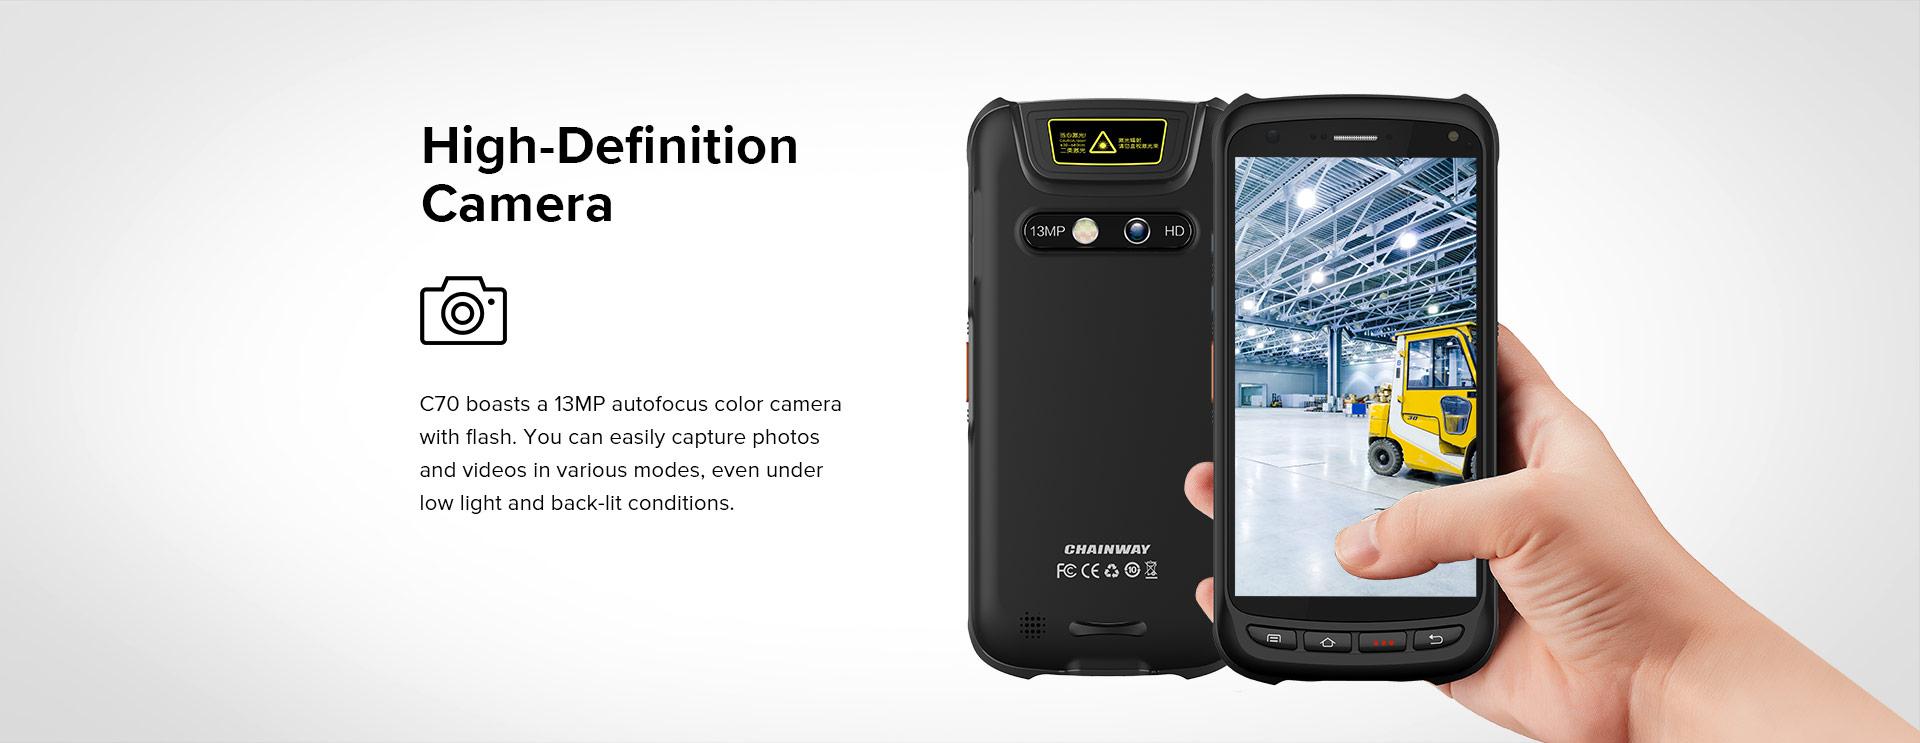 Handheld C70 Chainway High Definition camera